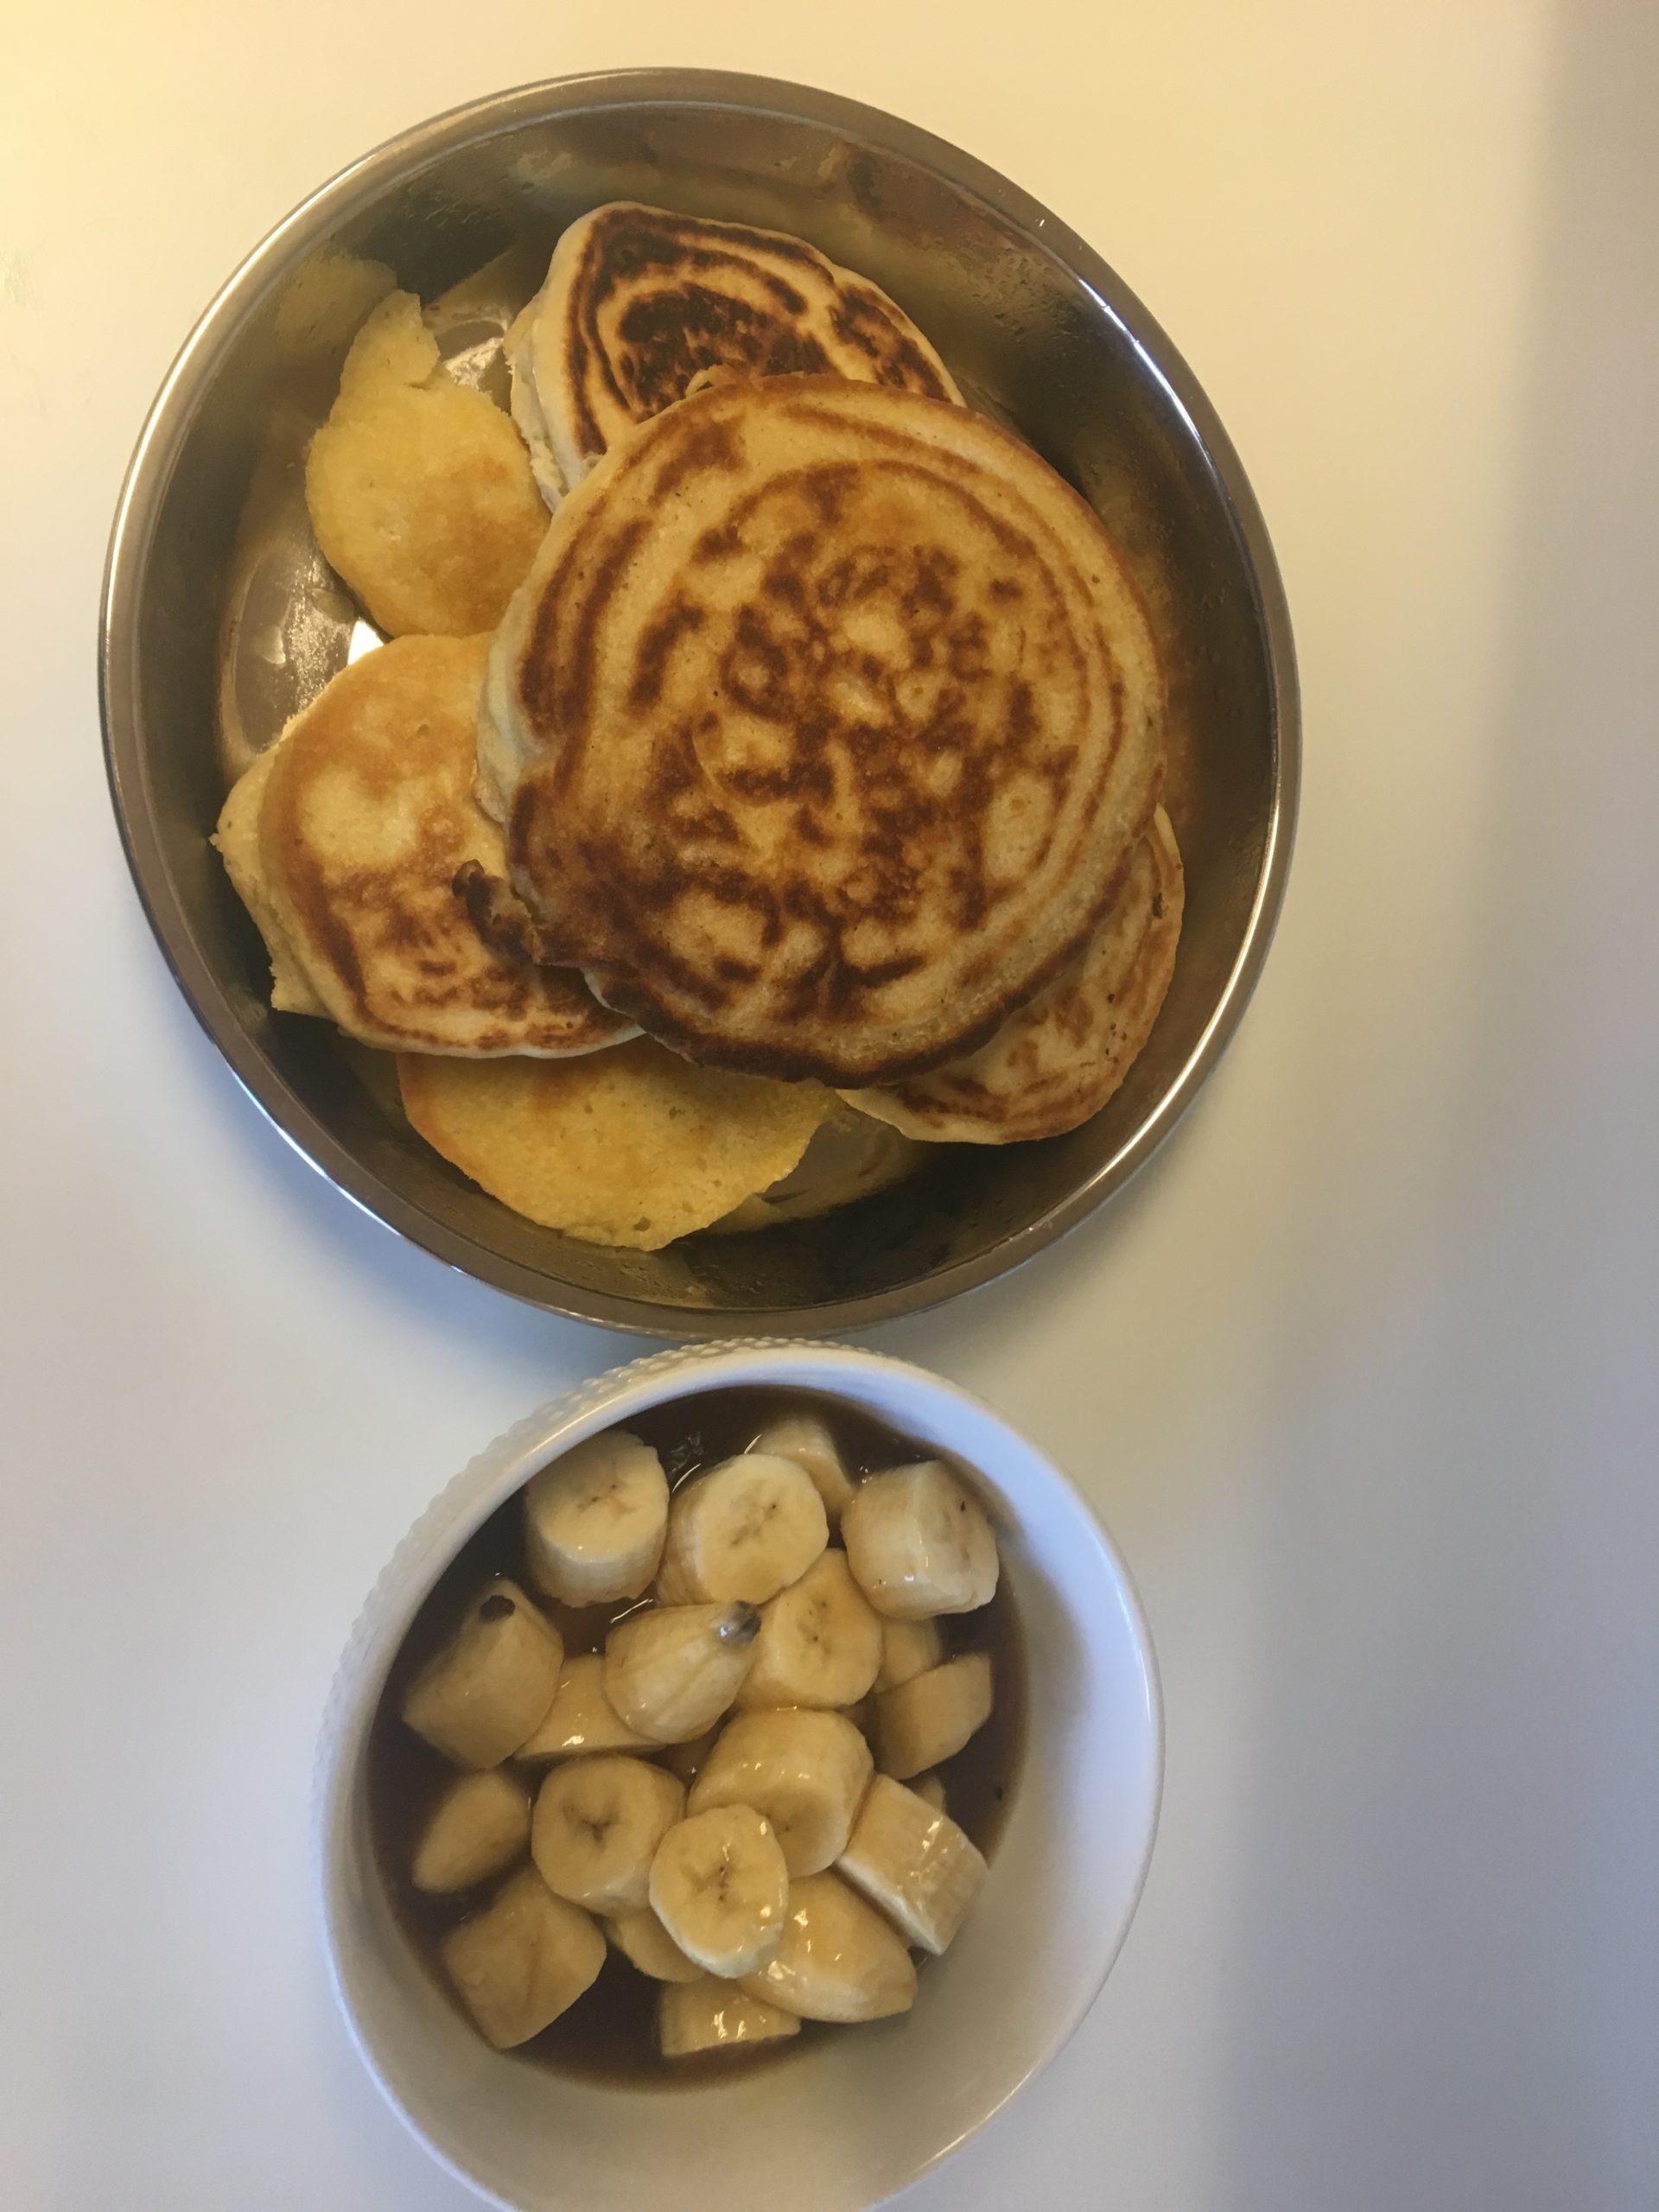 pancakes with bananas